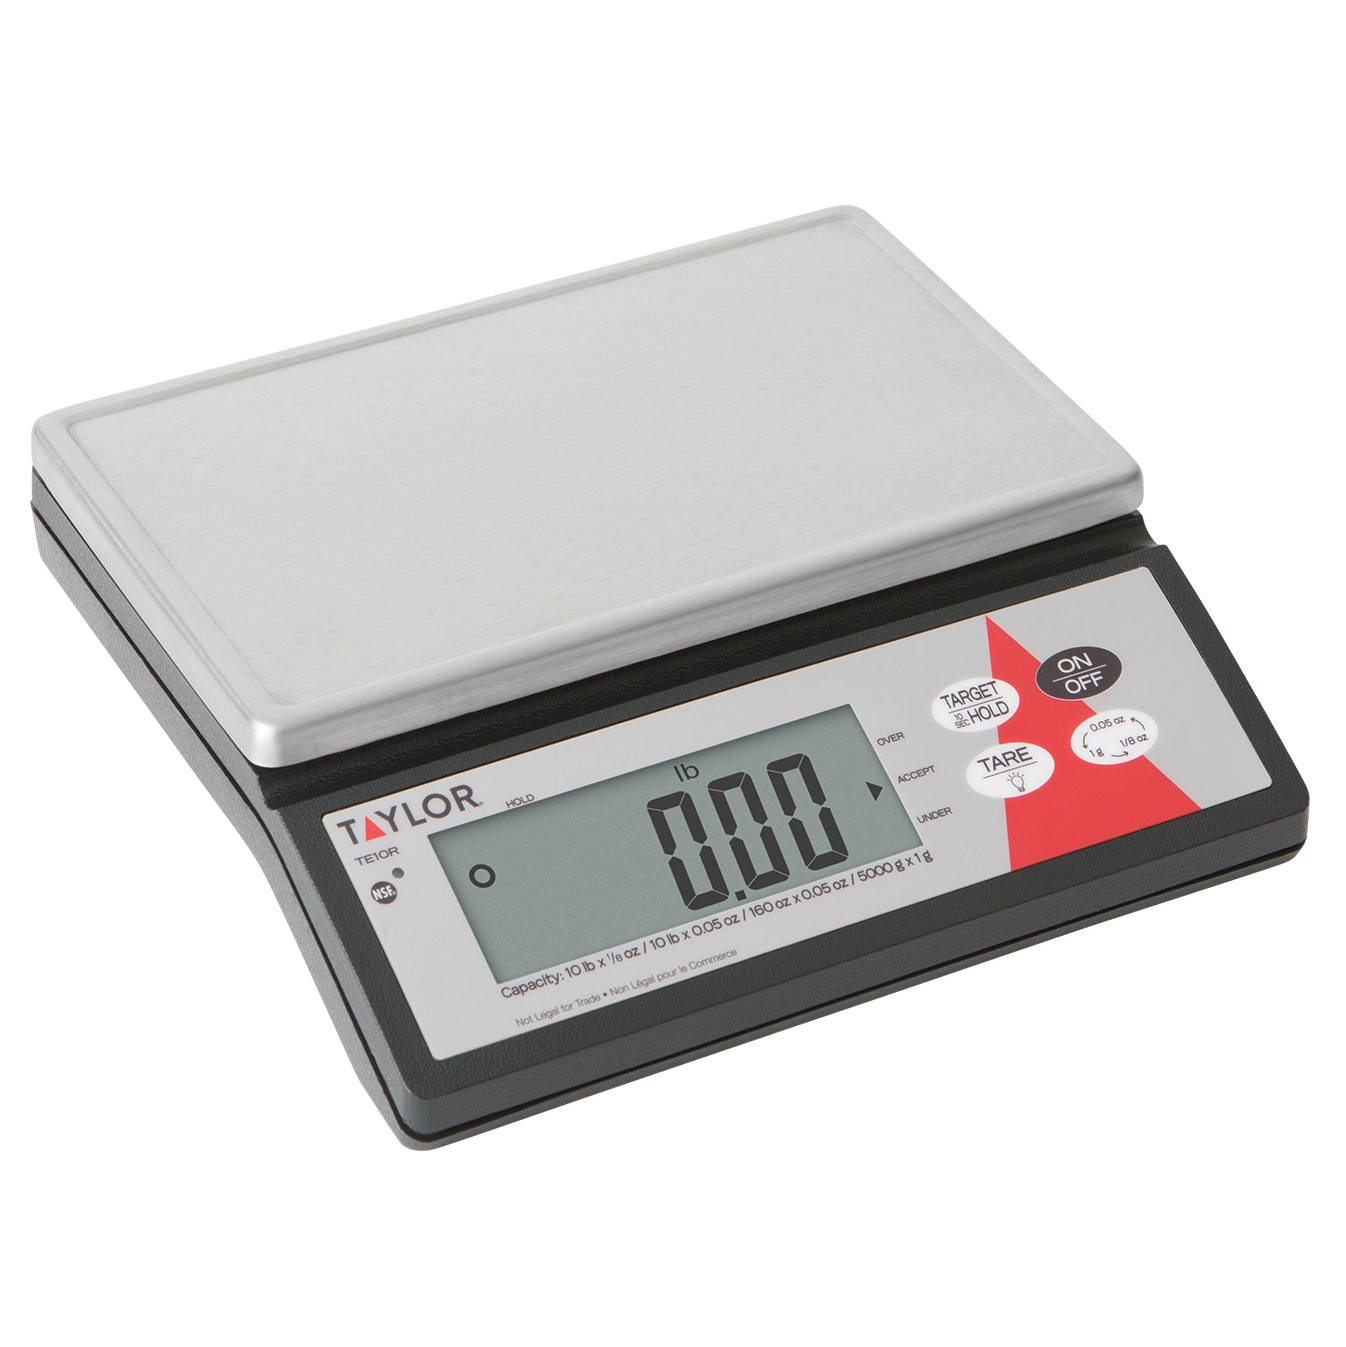 Taylor Precision TE10R scale, portion, digital